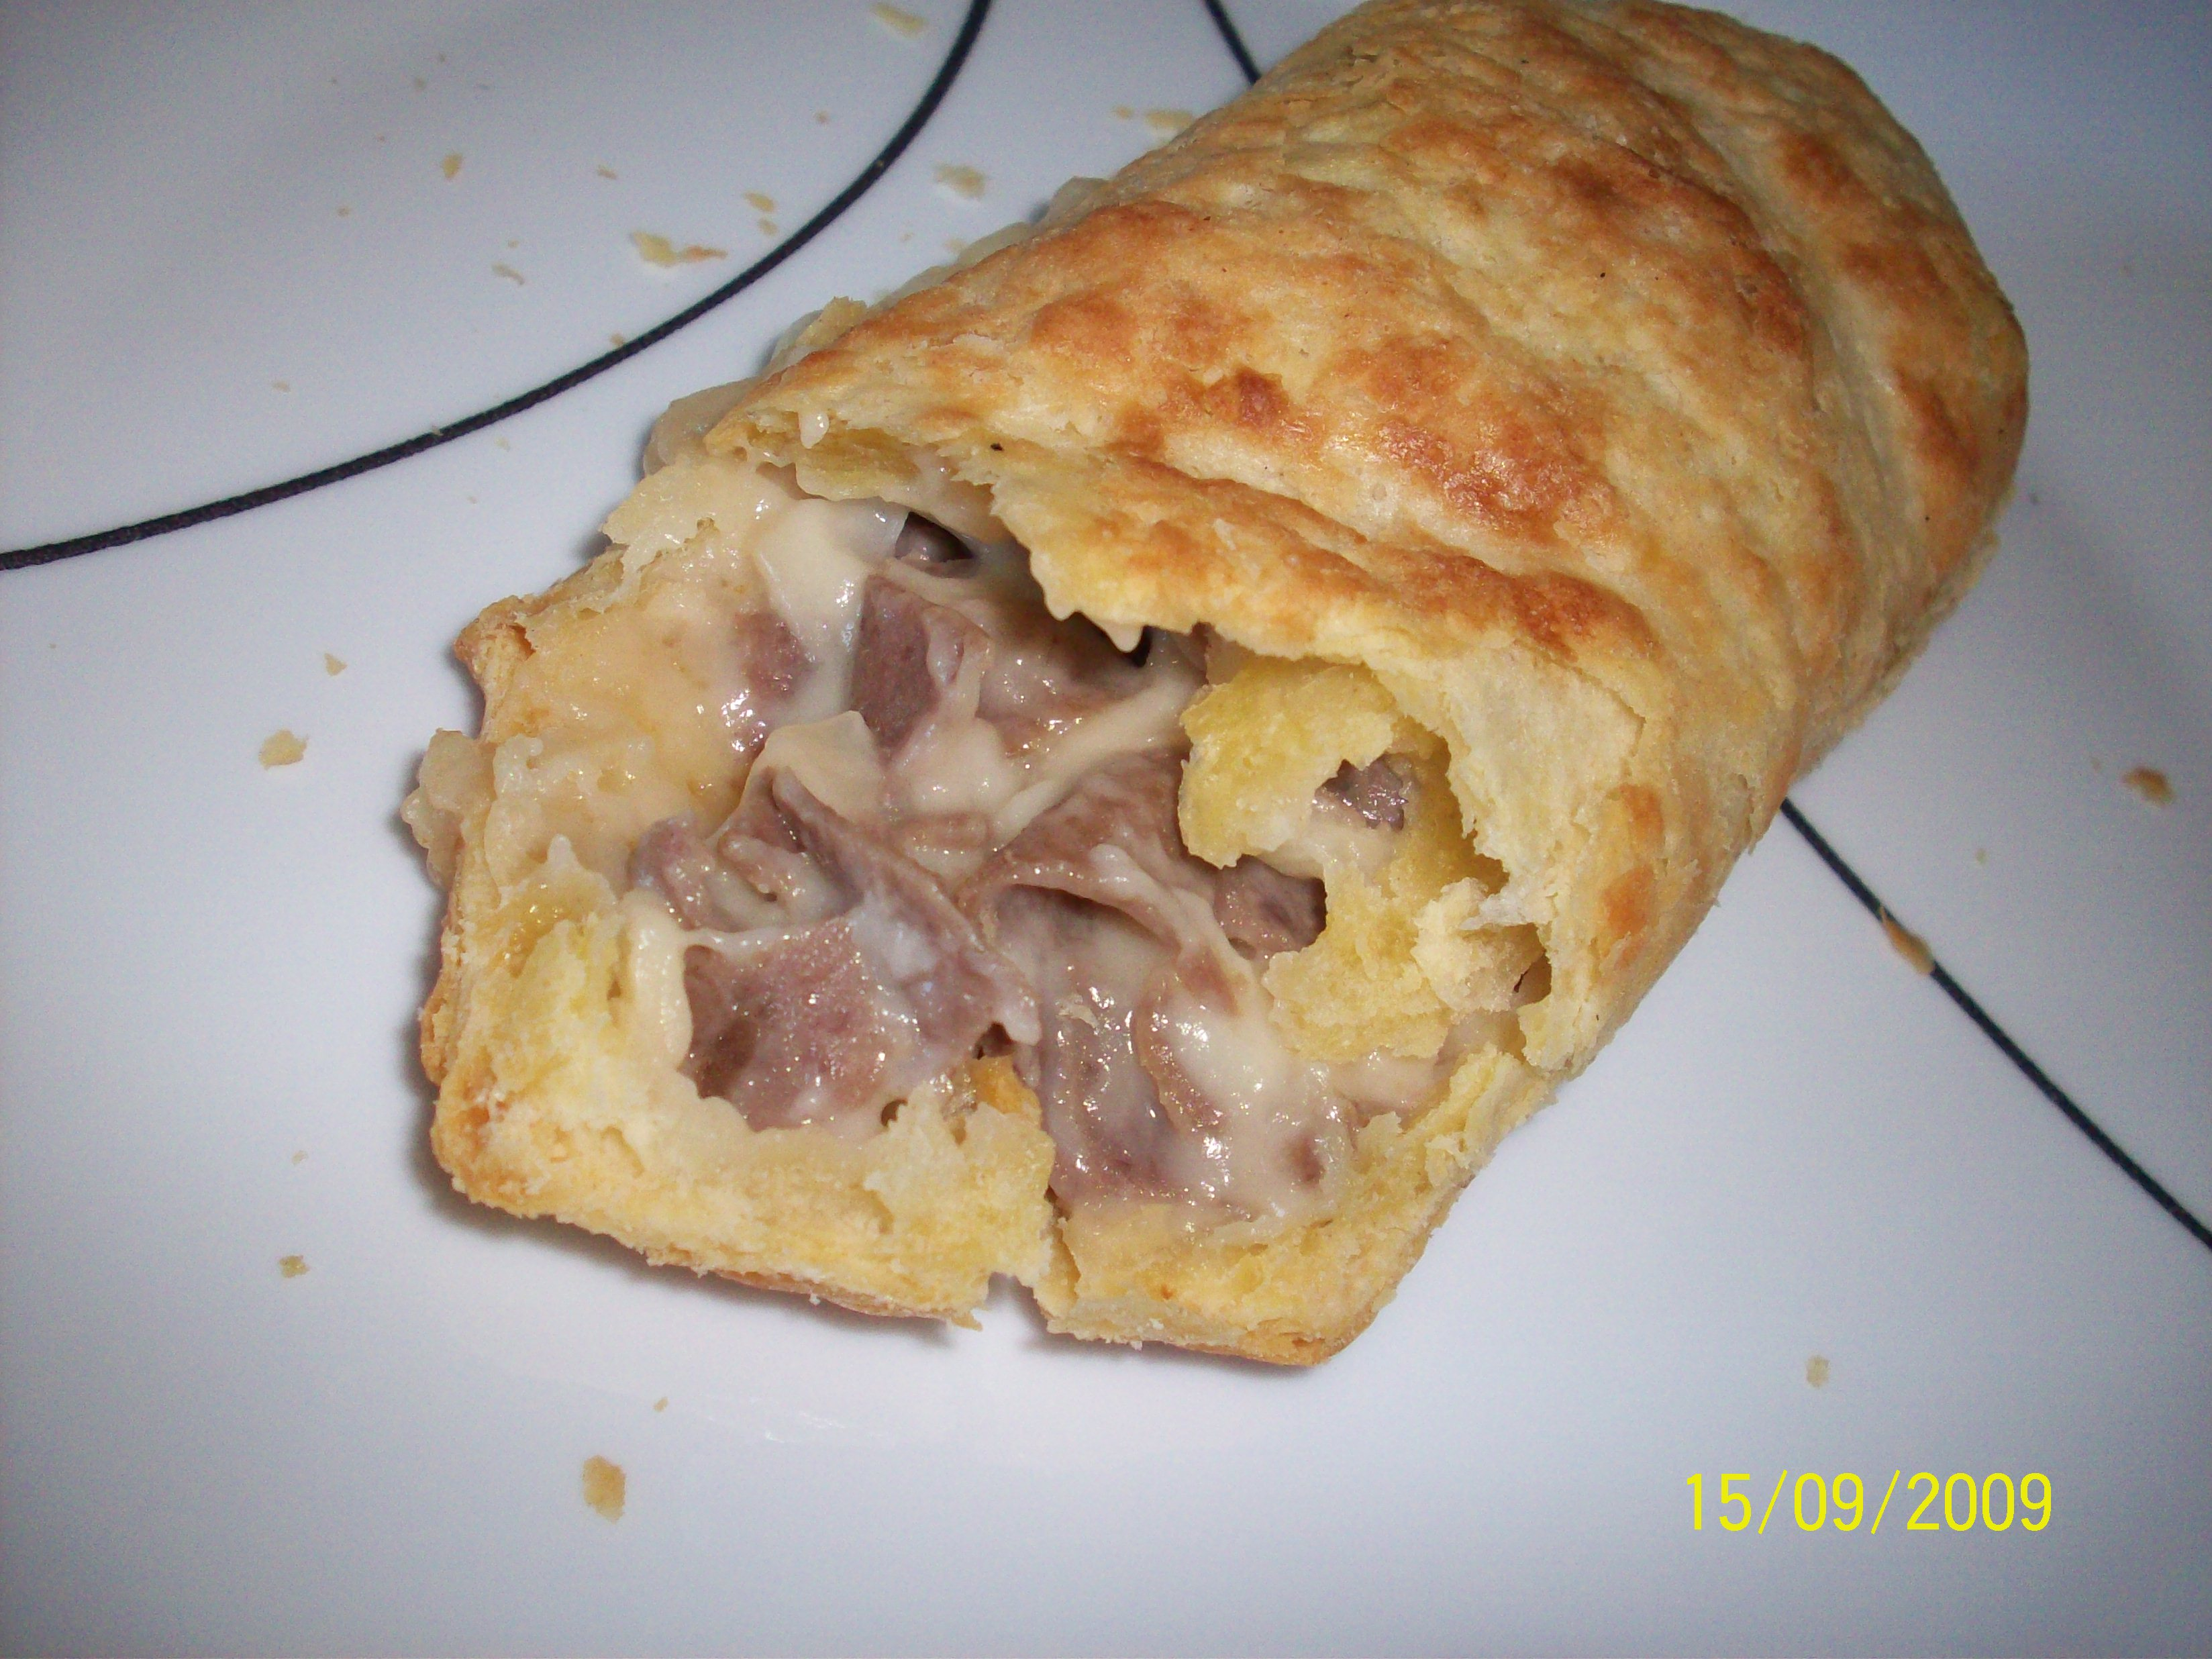 https://foodloader.net/cutie_2009-09-15_Crustini_Philli-Style_Steak_and_Cheese.jpg